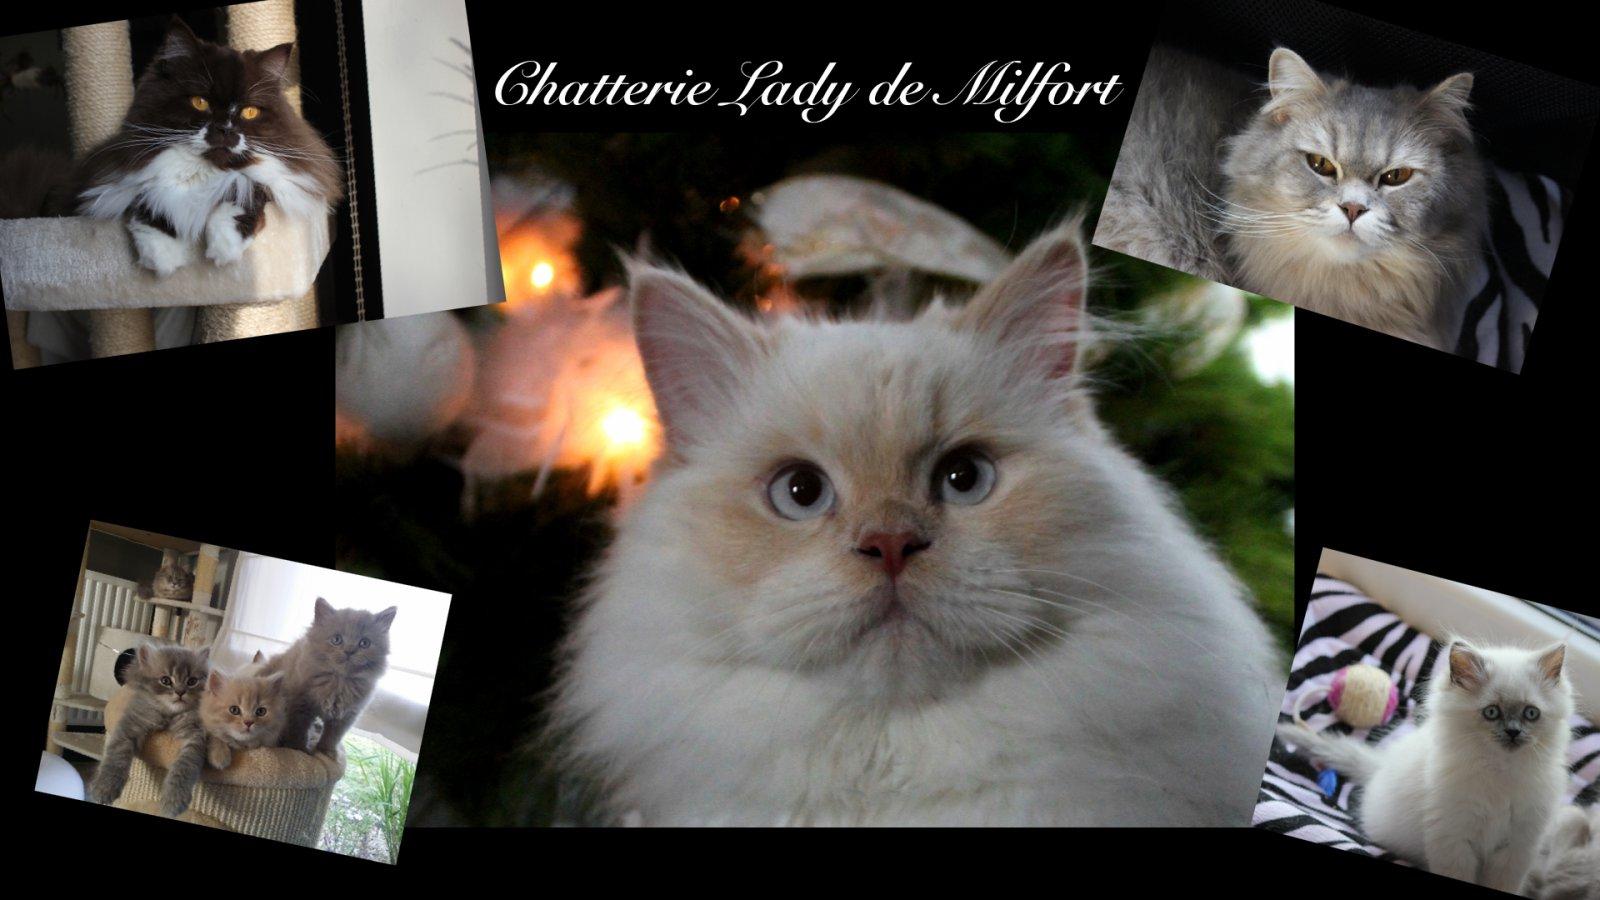 Chatterie Lady De Milfort